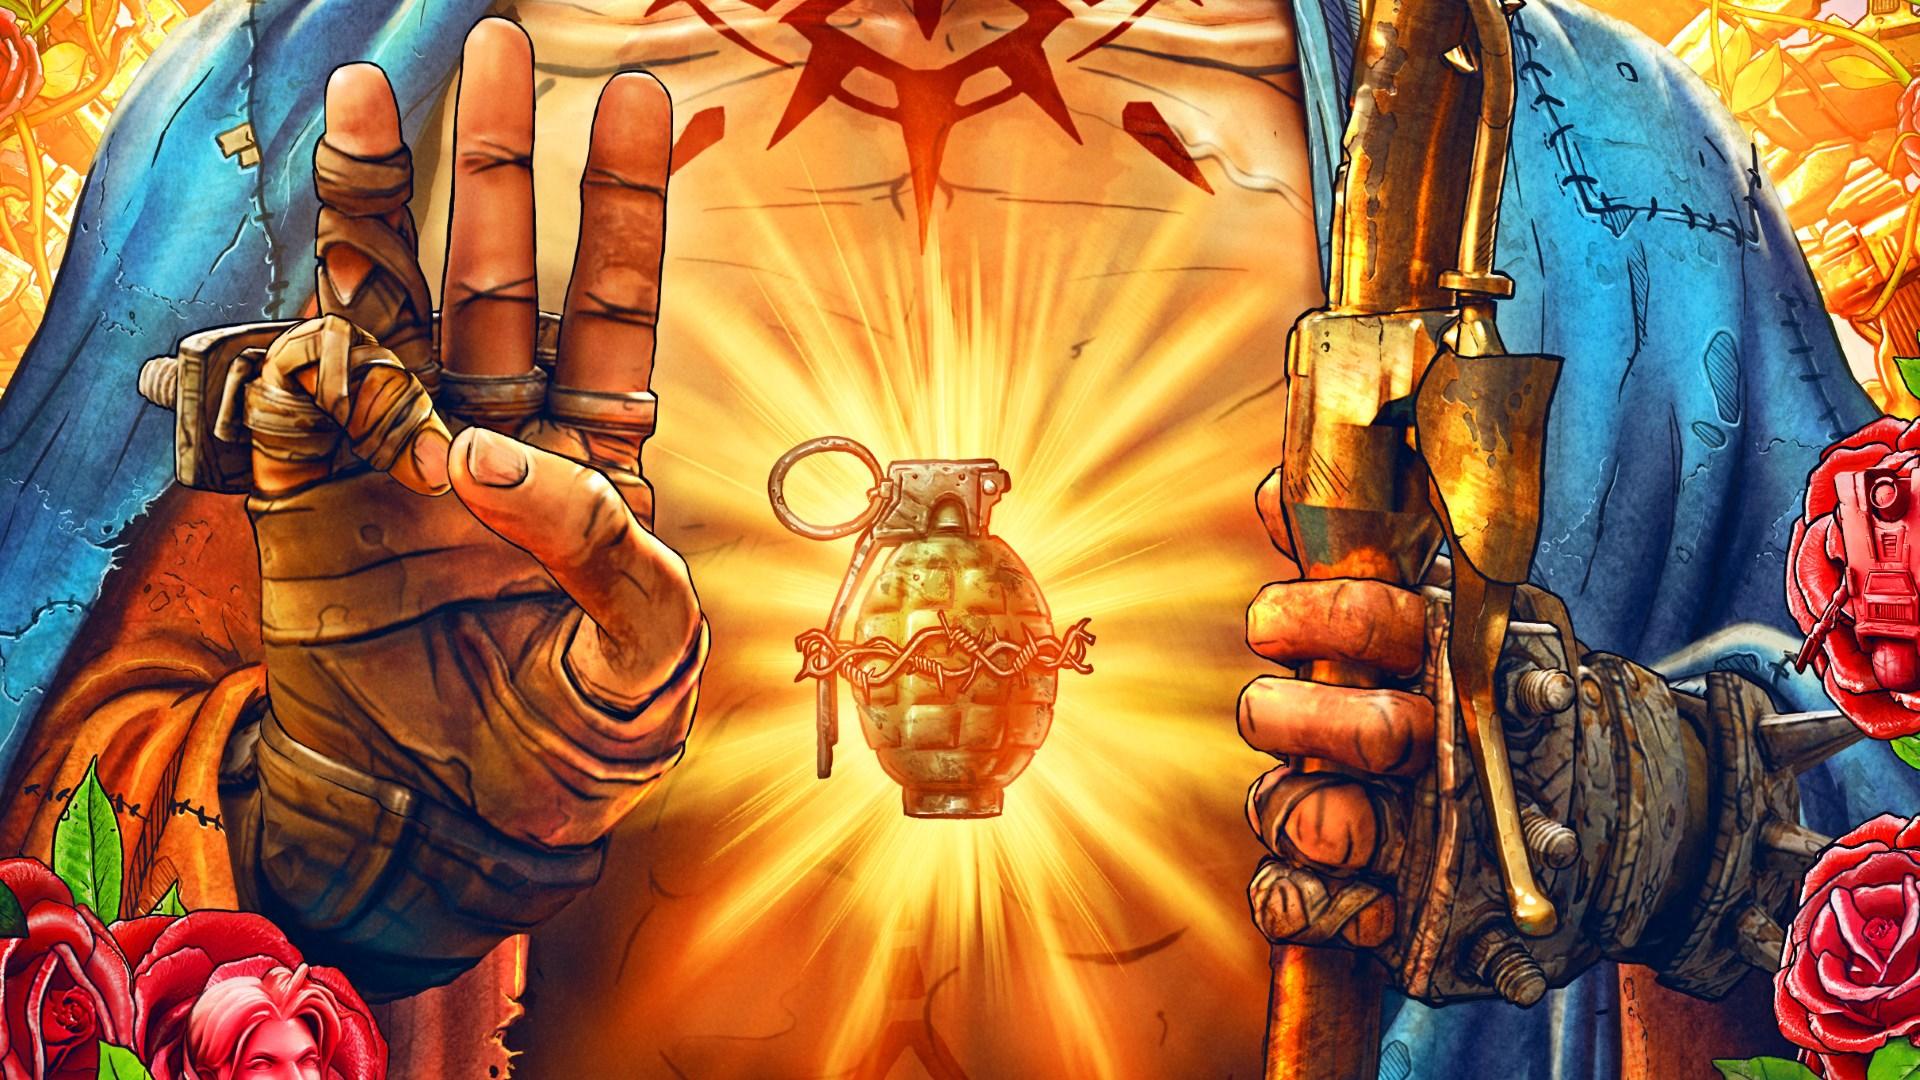 Gearbox Teases More Secrets Hidden In The Borderlands 3 Cover Art